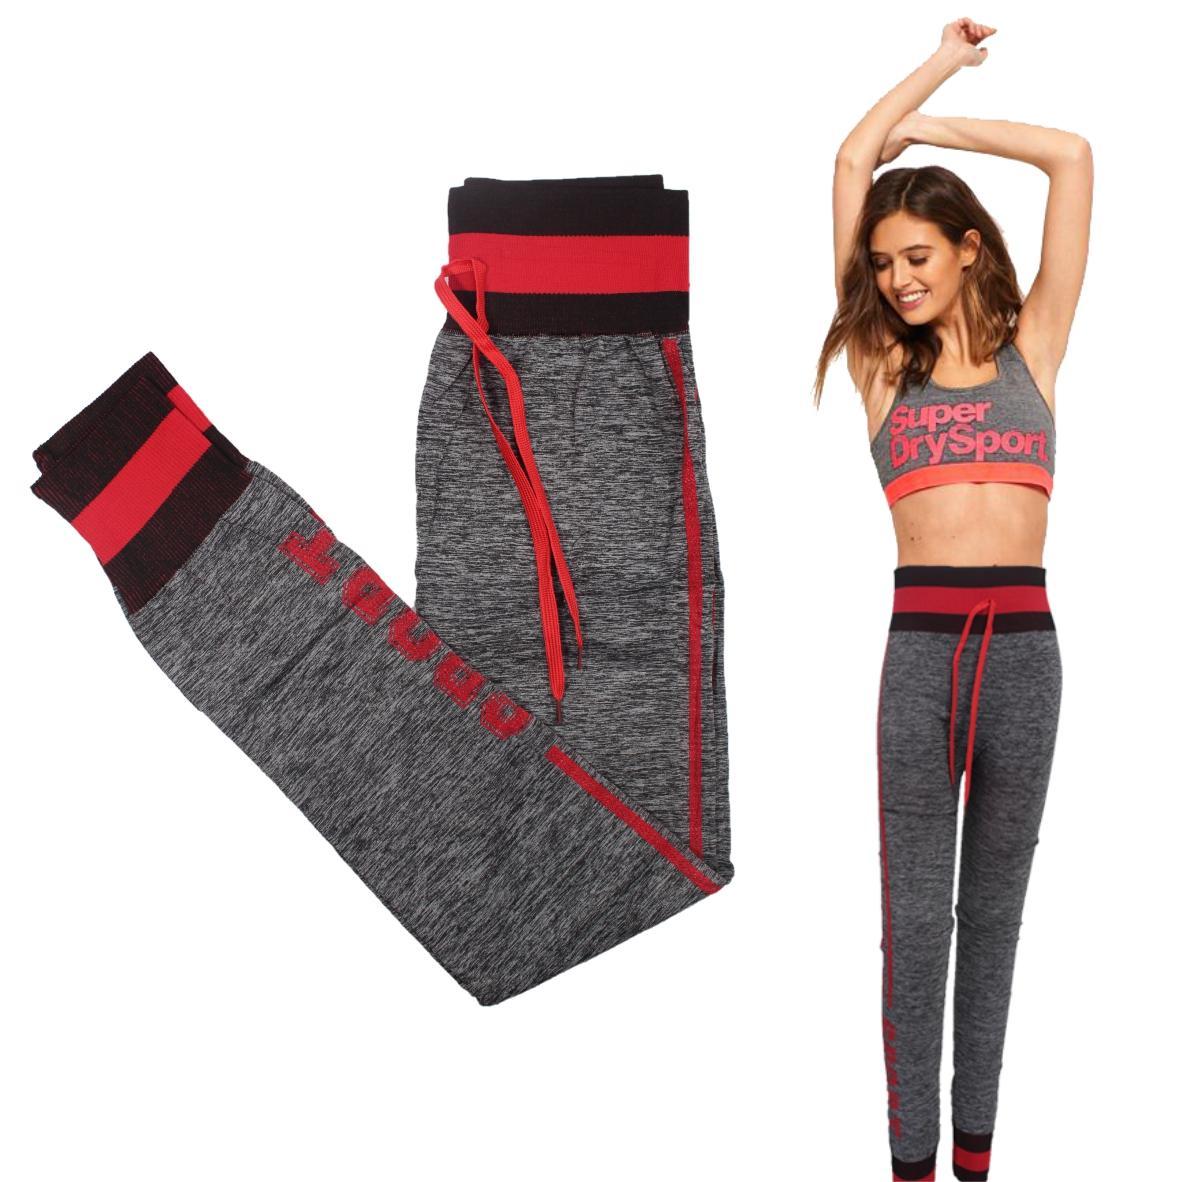 Weitech Sports Legging / Celana Legging Olahraga Wanita / Celana Yoga / Celana Senam / Celana Fitness 776 By Weitech